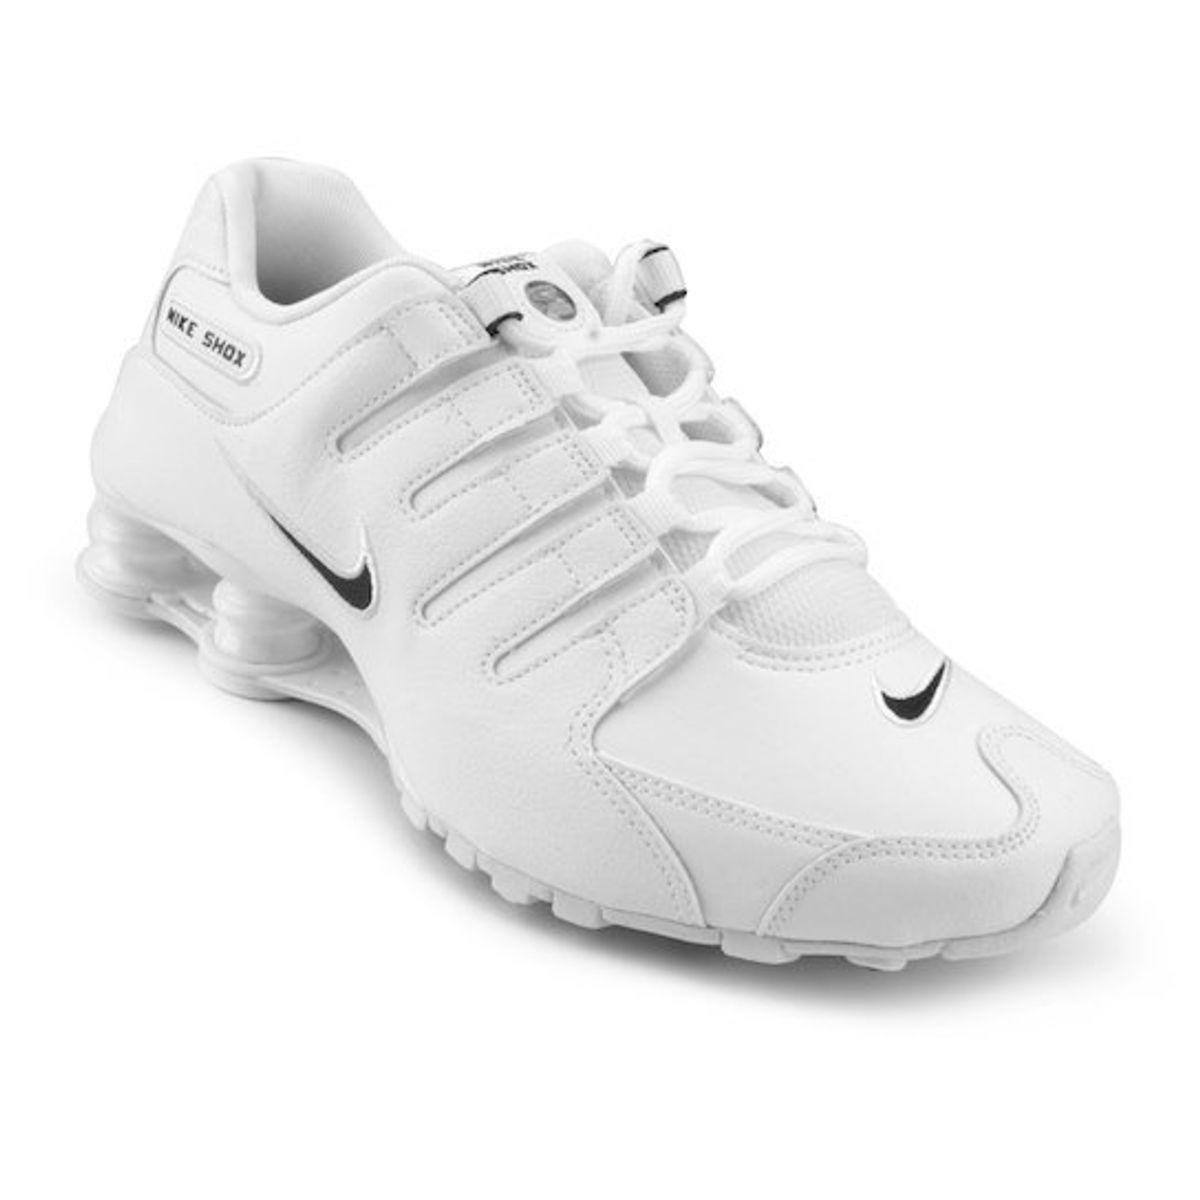 factory authentic 12871 09f9f Nike Shox Nz Branco White Original Novo Número 40   Tênis Masculino Nike  Nunca Usado 34685998   enjoei